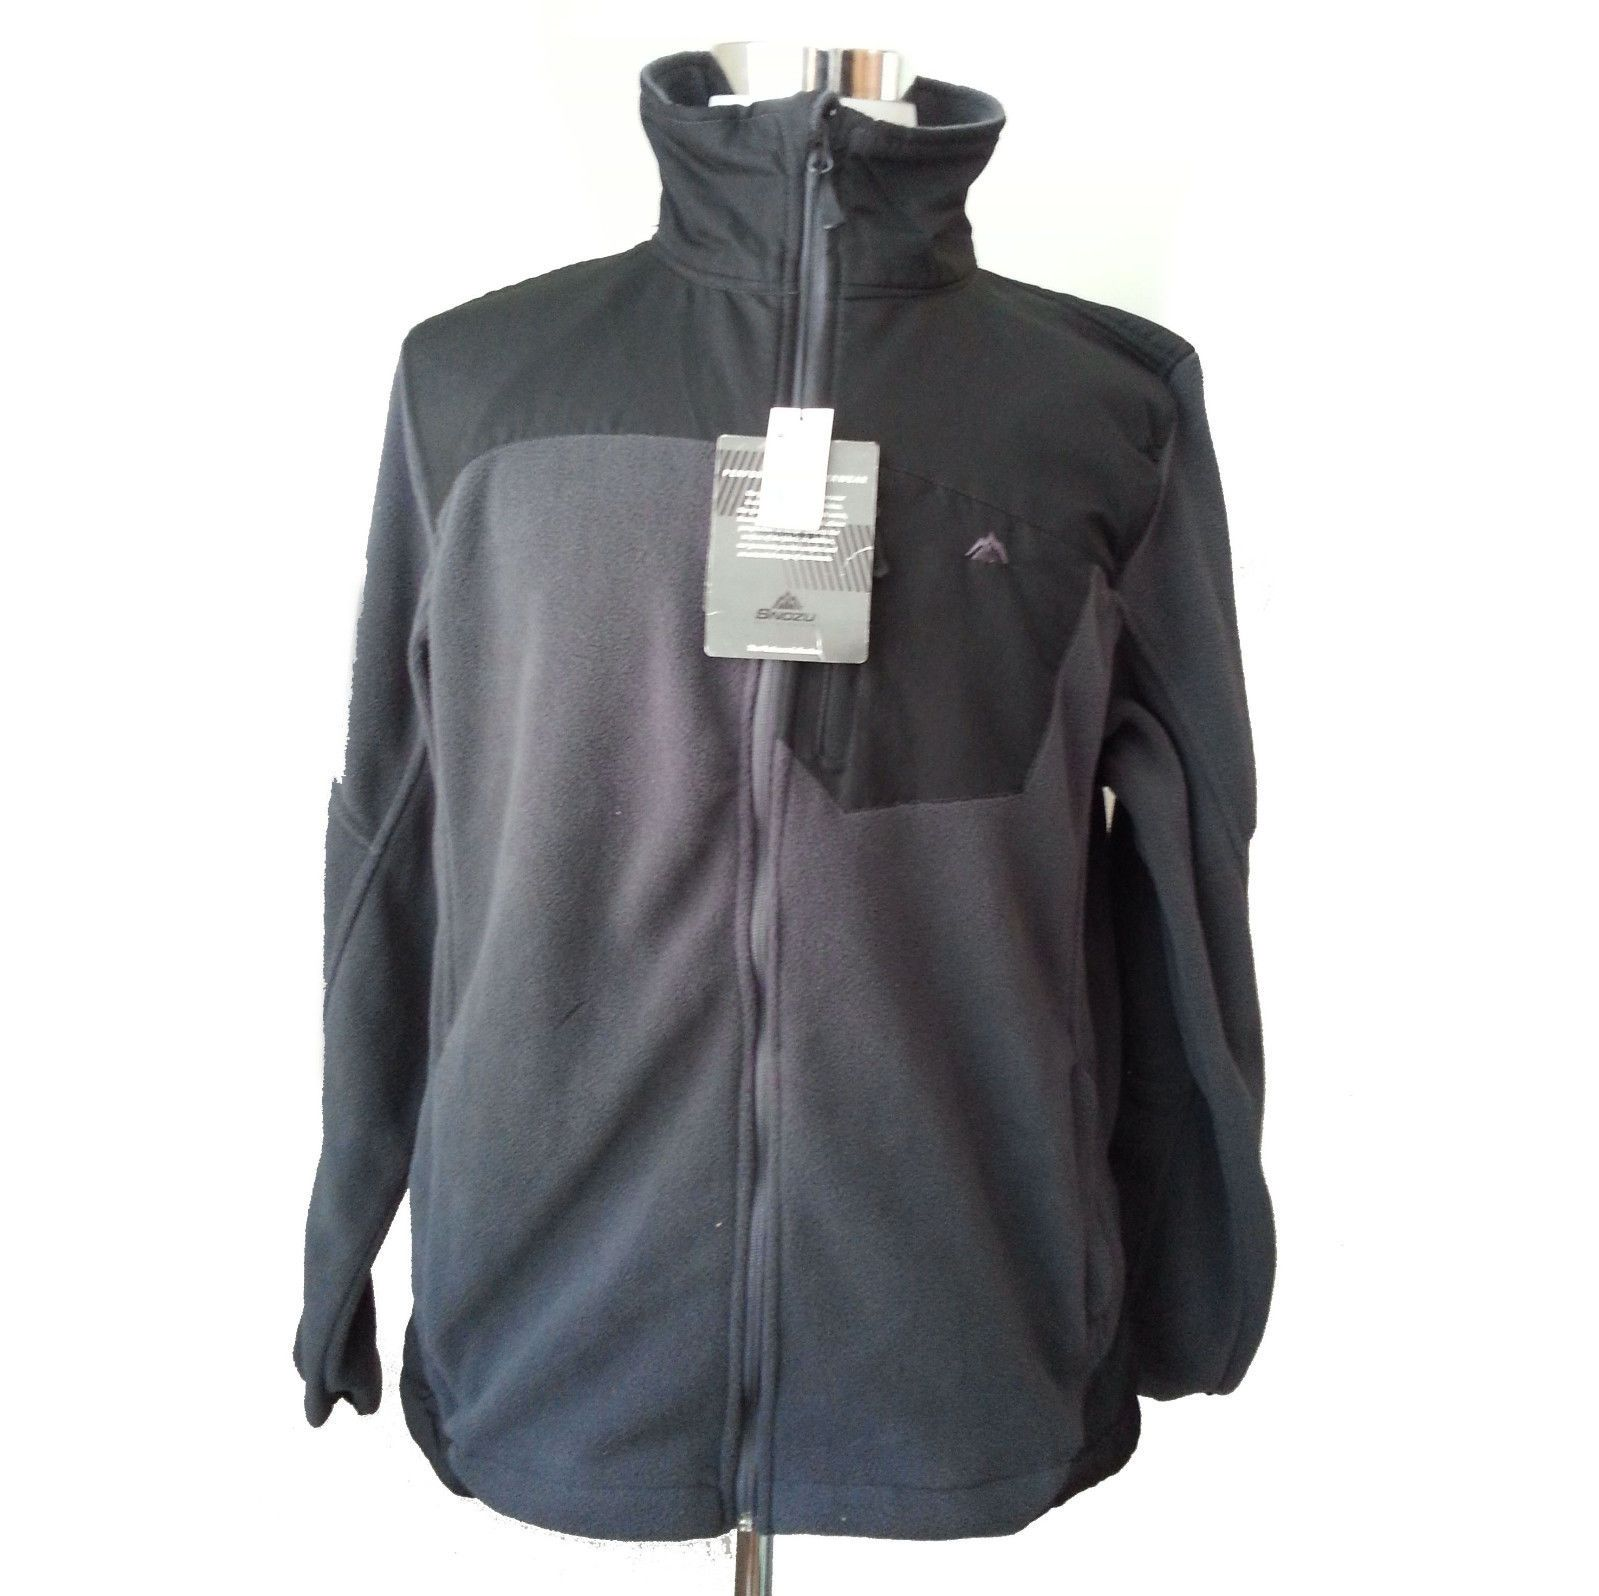 Ebay fixboatquick snozu men size l black fleece jacket full zip new